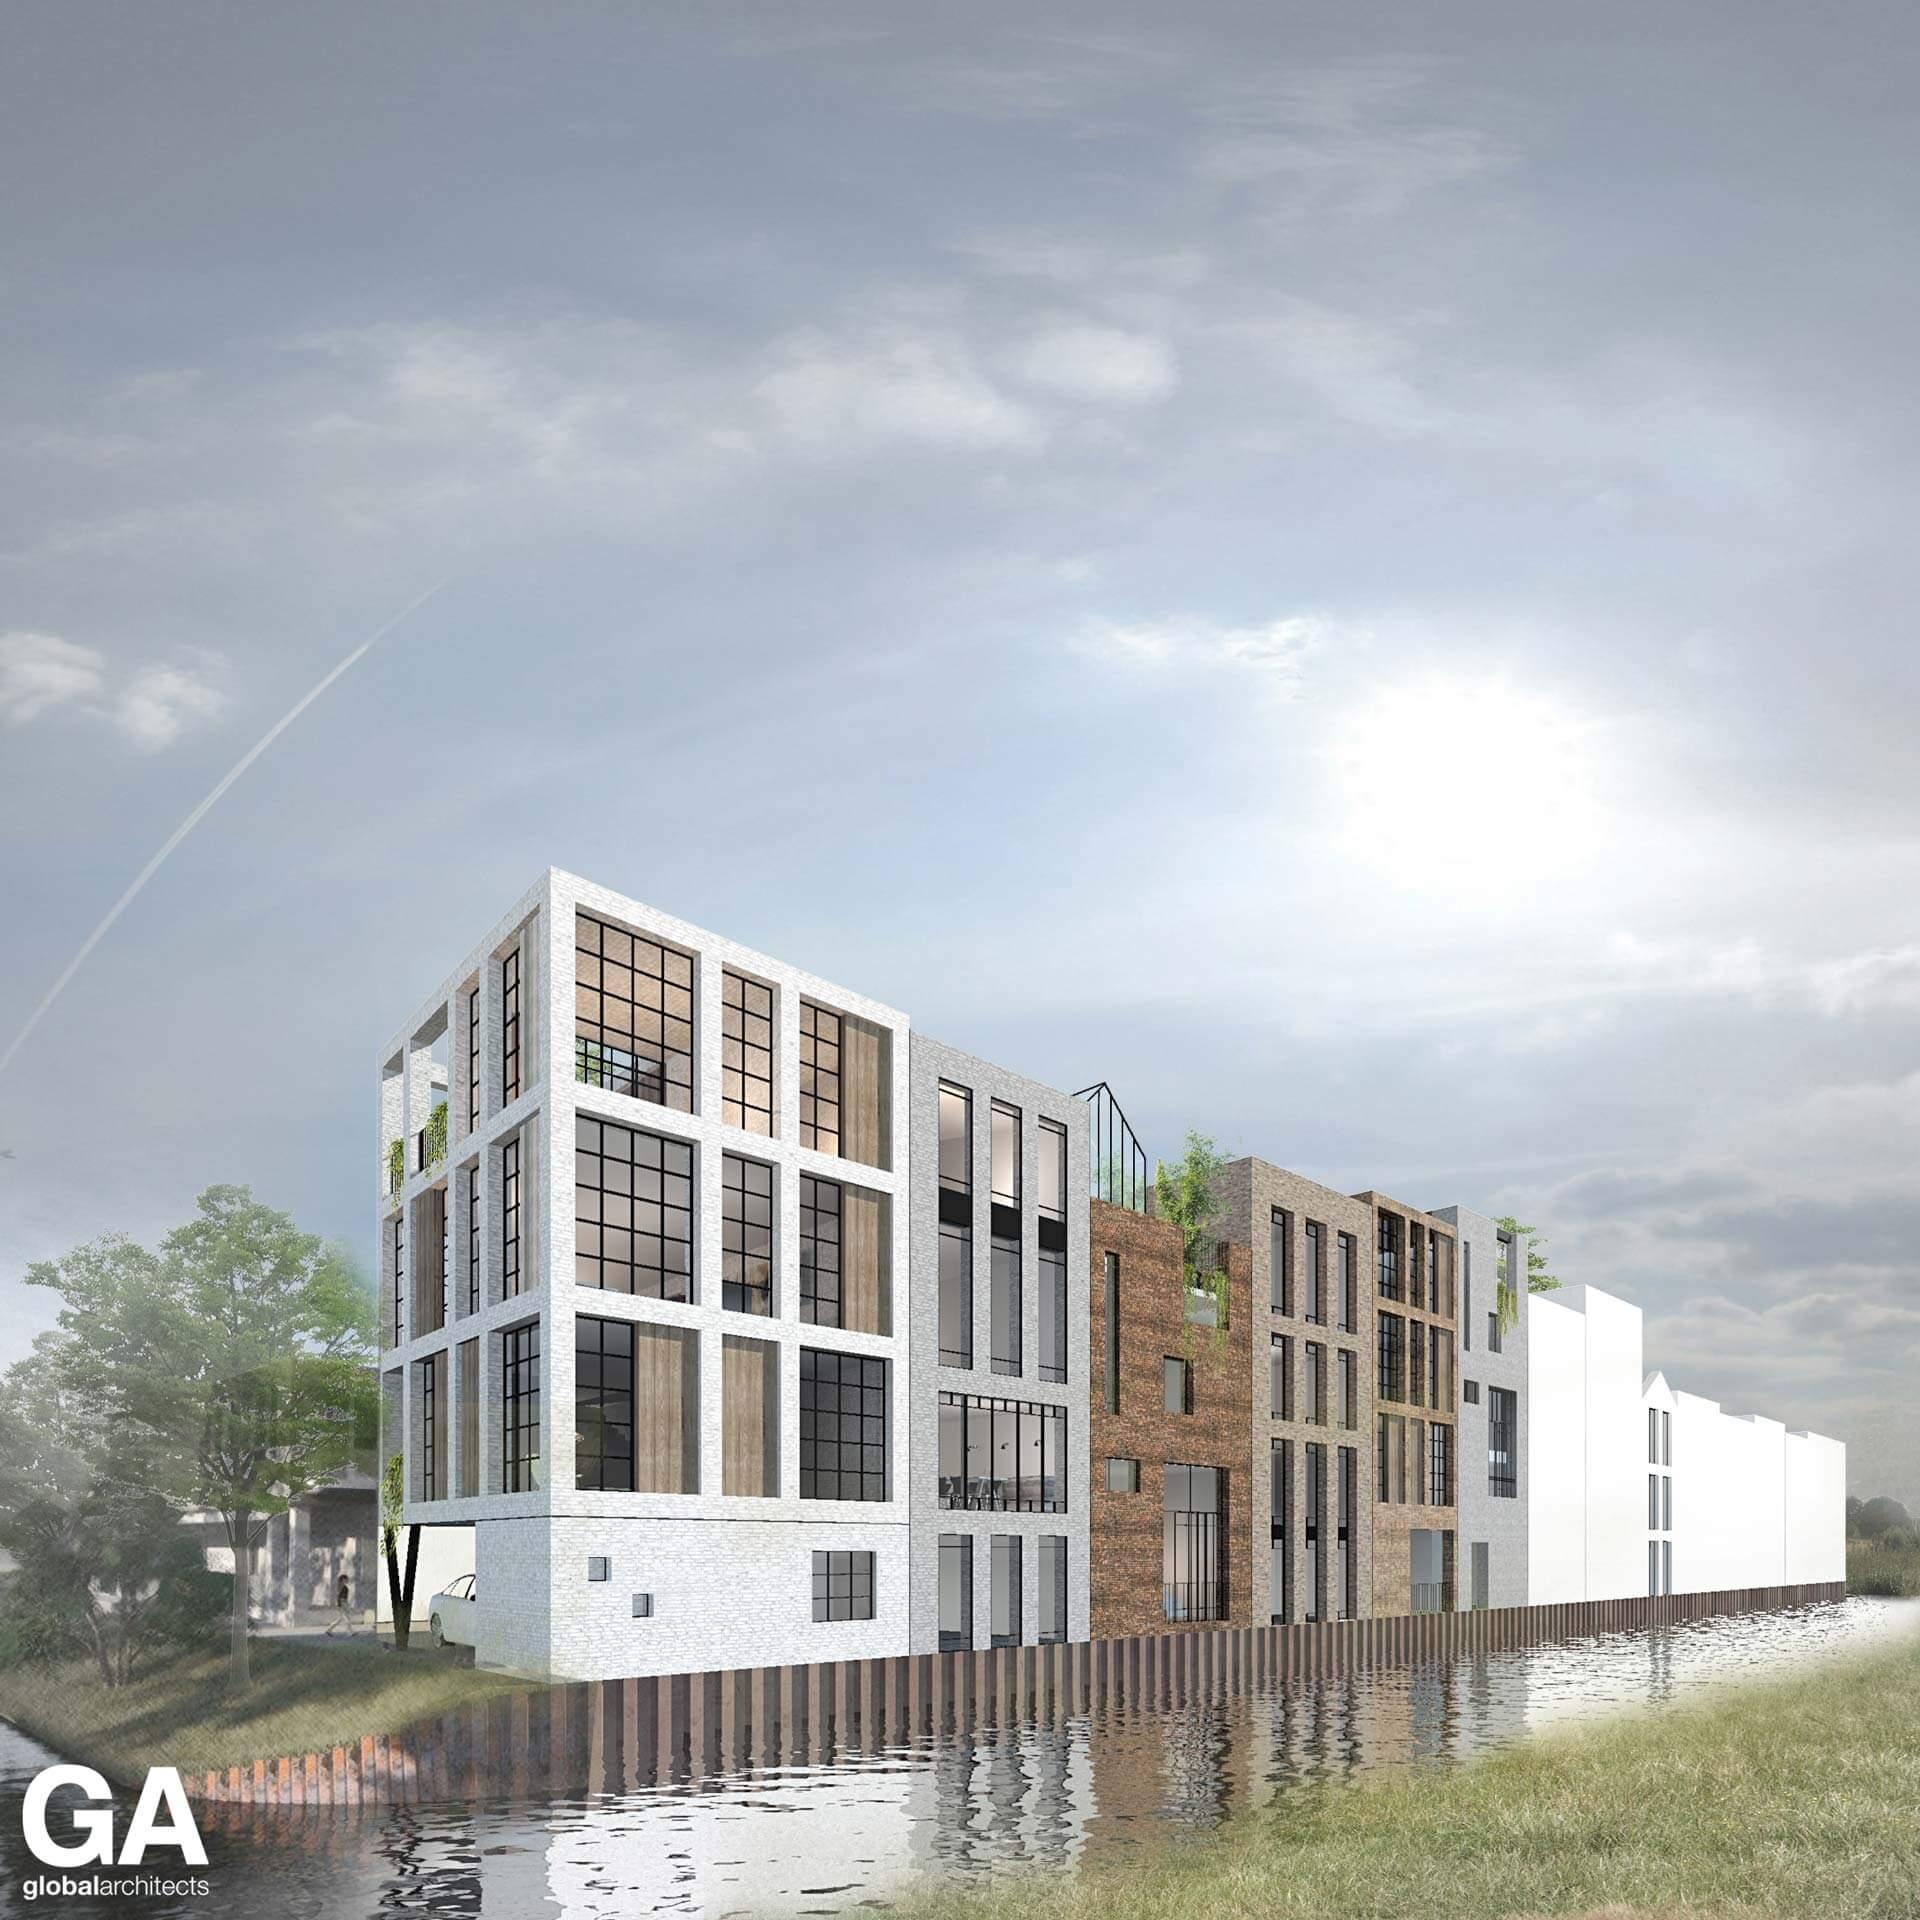 Steenvlinder Leiden Global Architects Nijverheid DN20 DN21 DN22 DN23 DN24